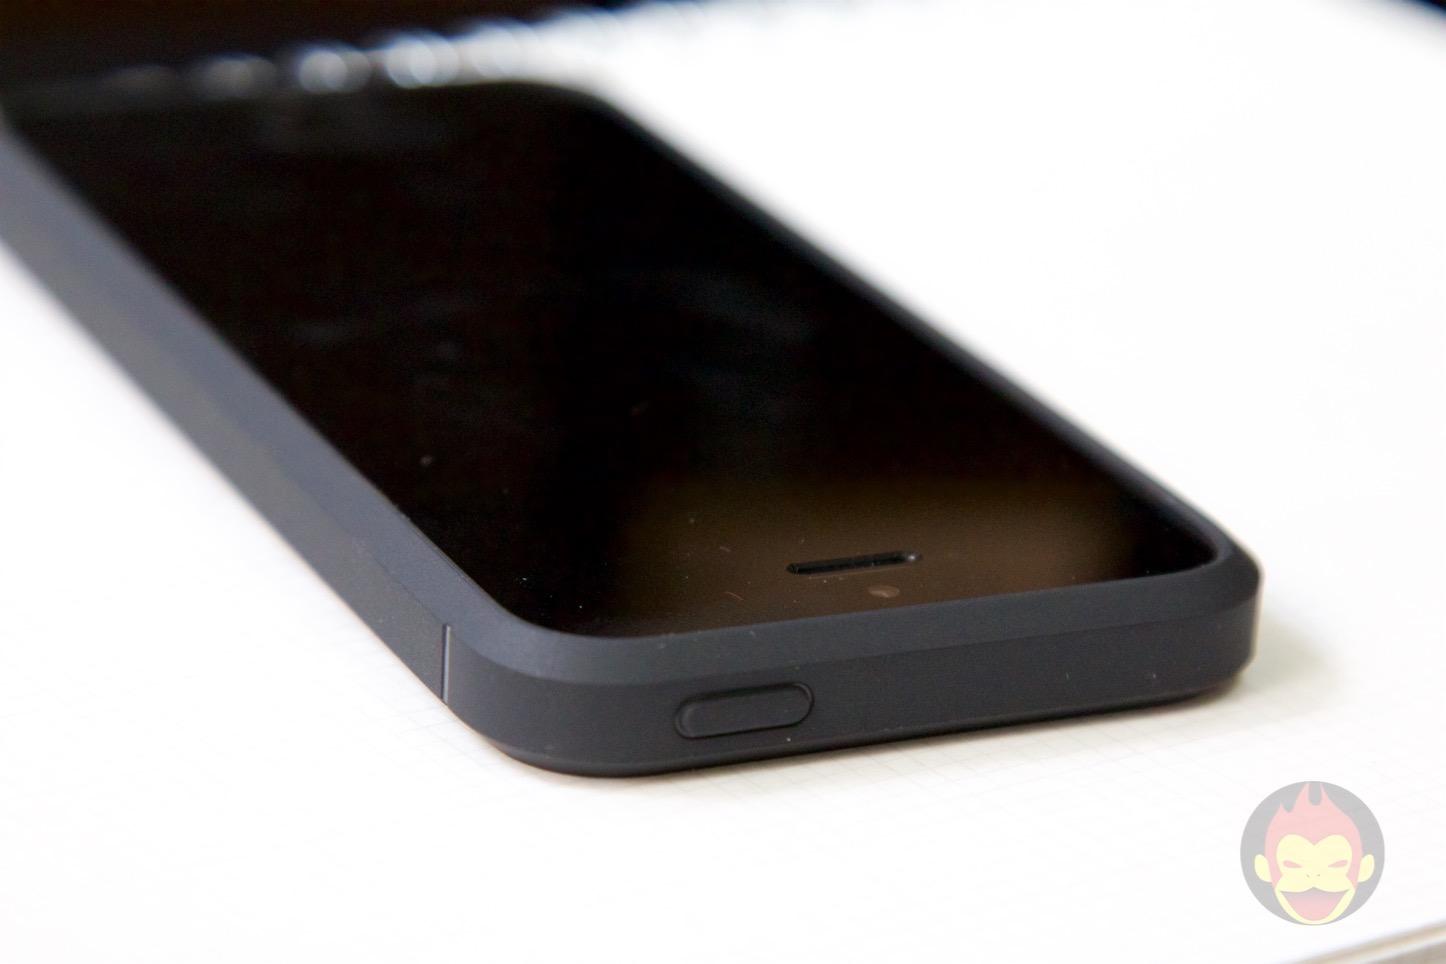 Spigen-Rugged-Case-iPhone-05.jpg